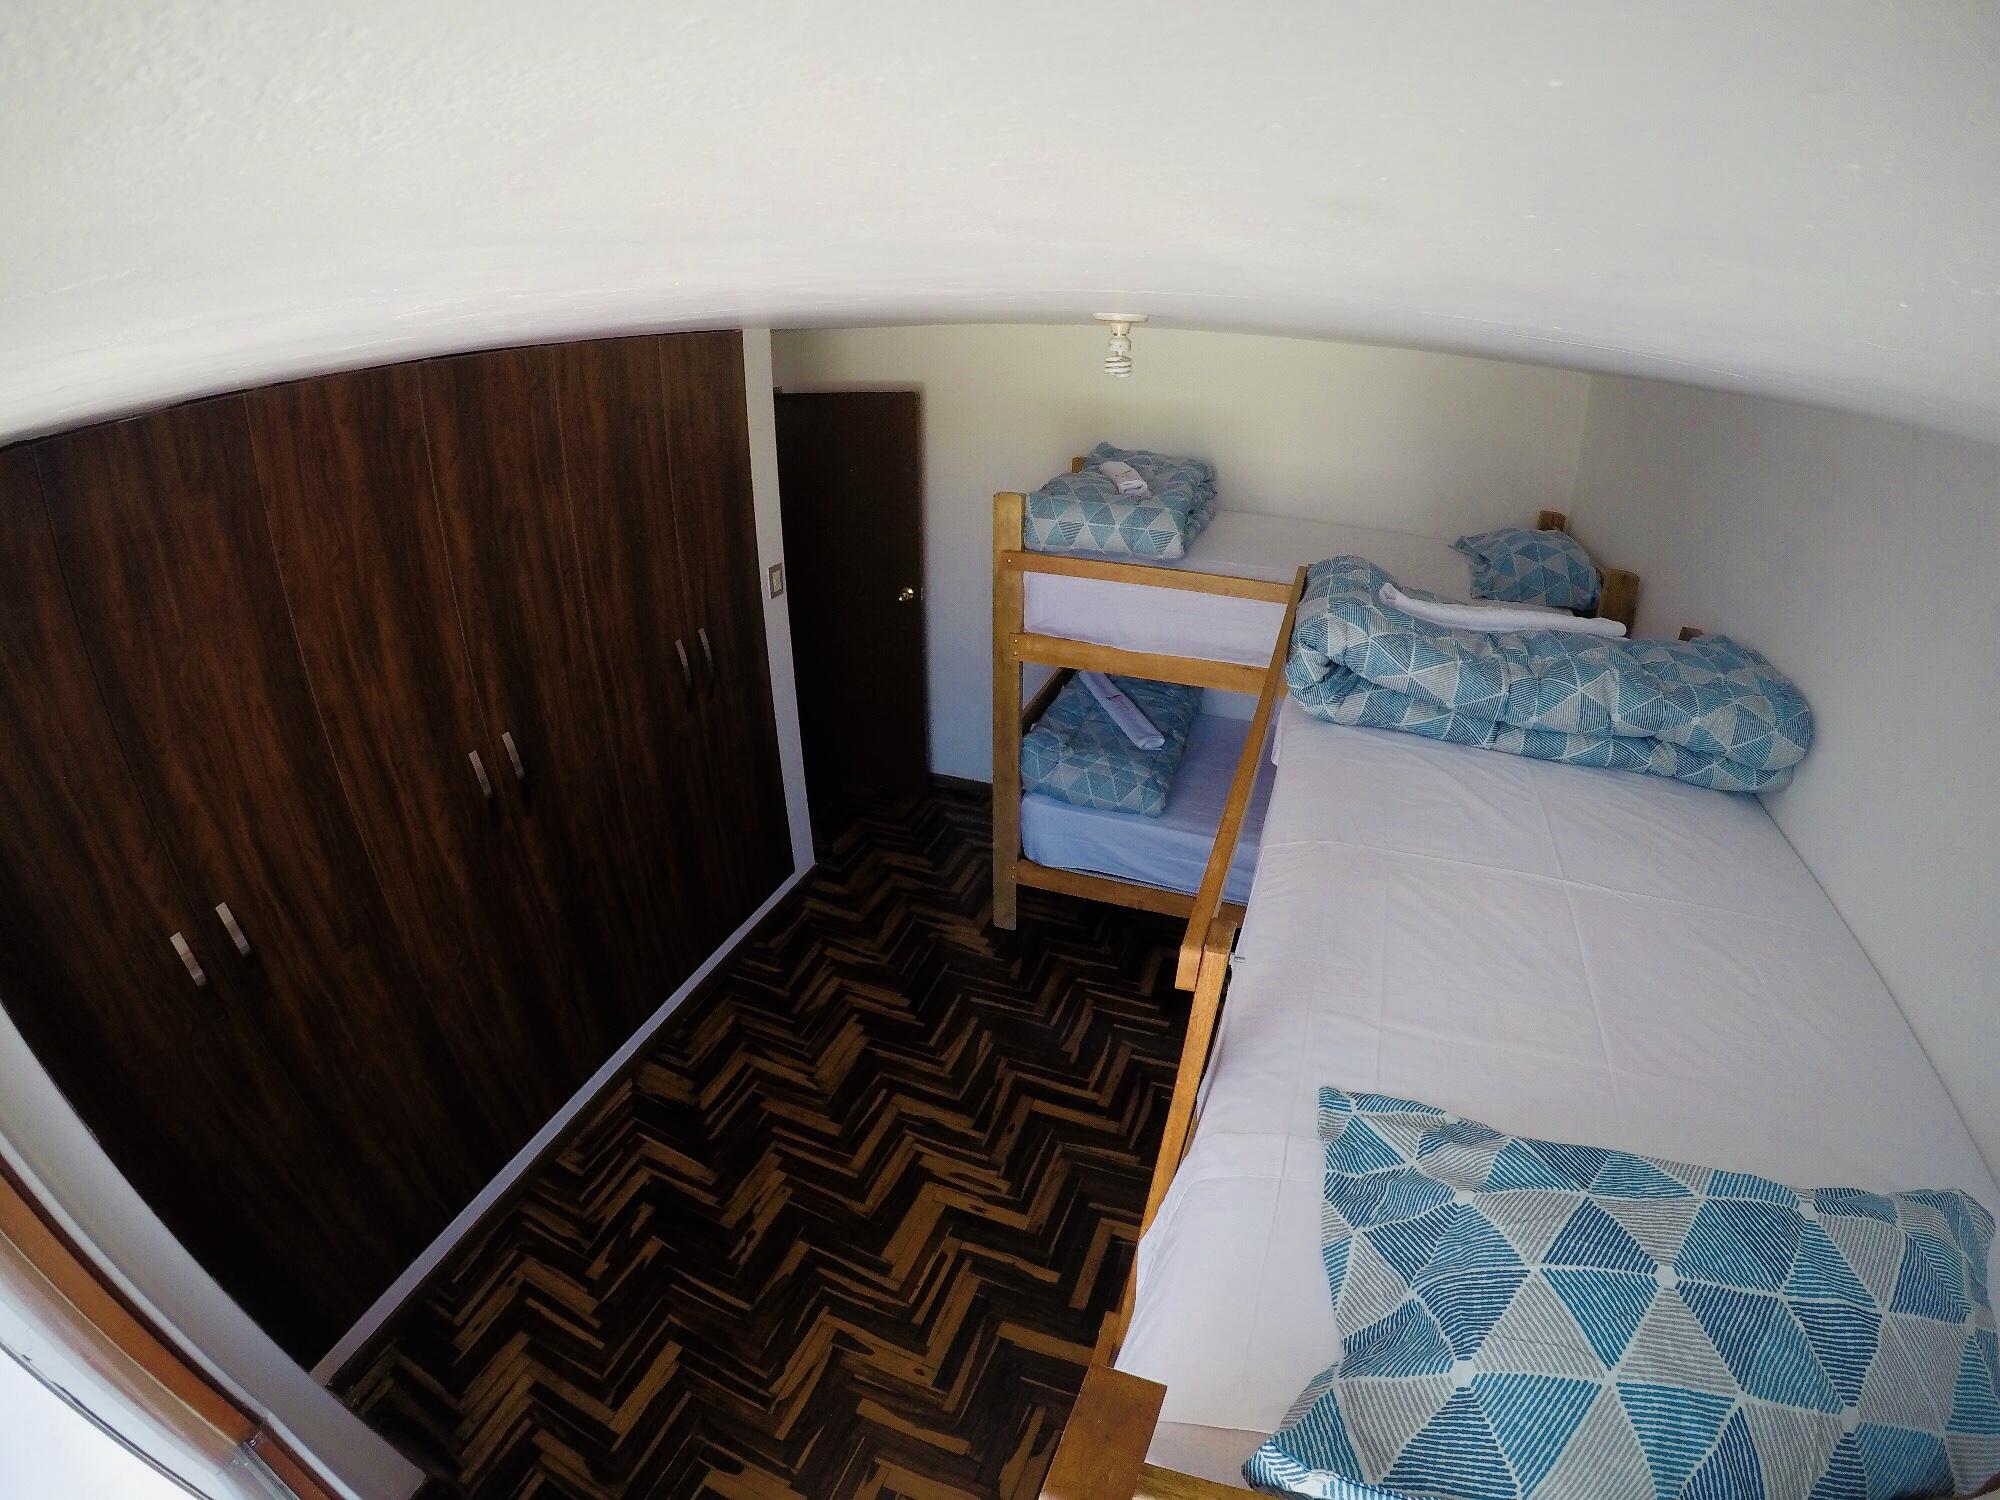 Carolinas Hostel